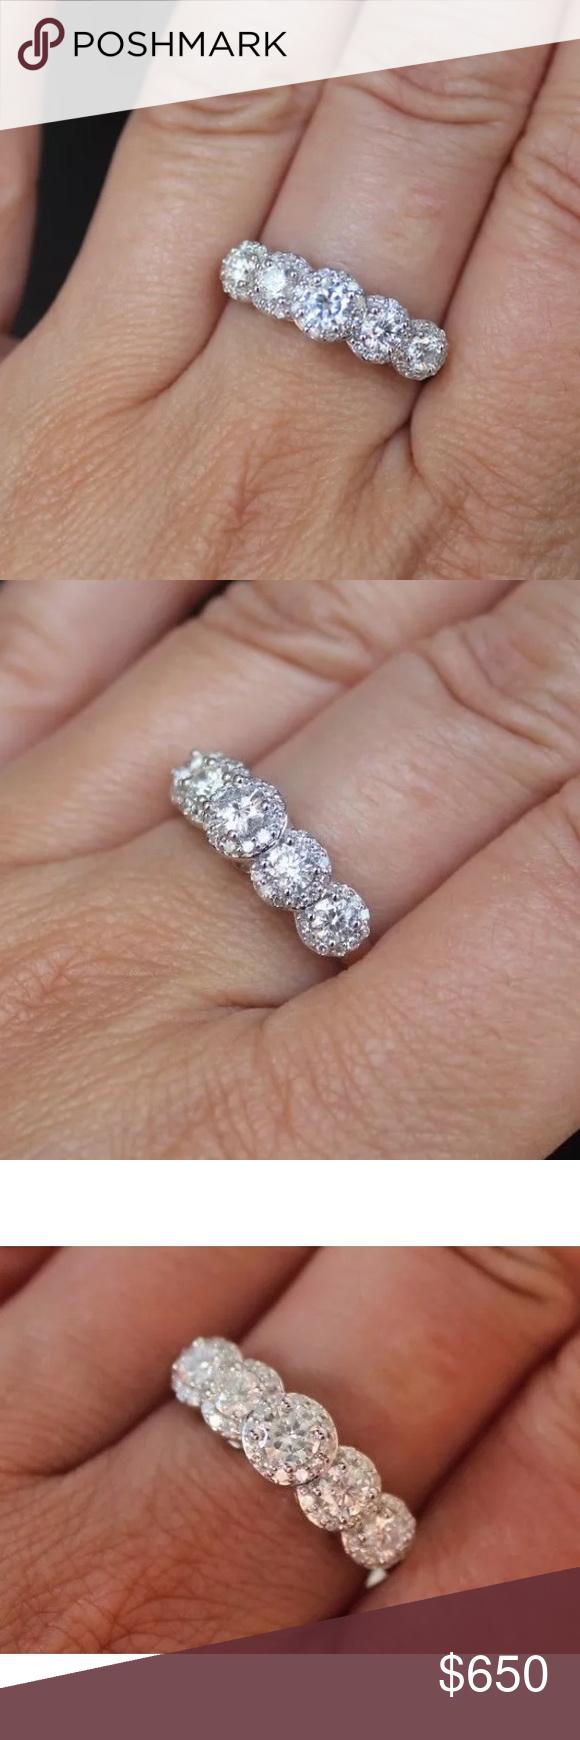 Beautiful k white gold carat diamond ring nwt my posh picks